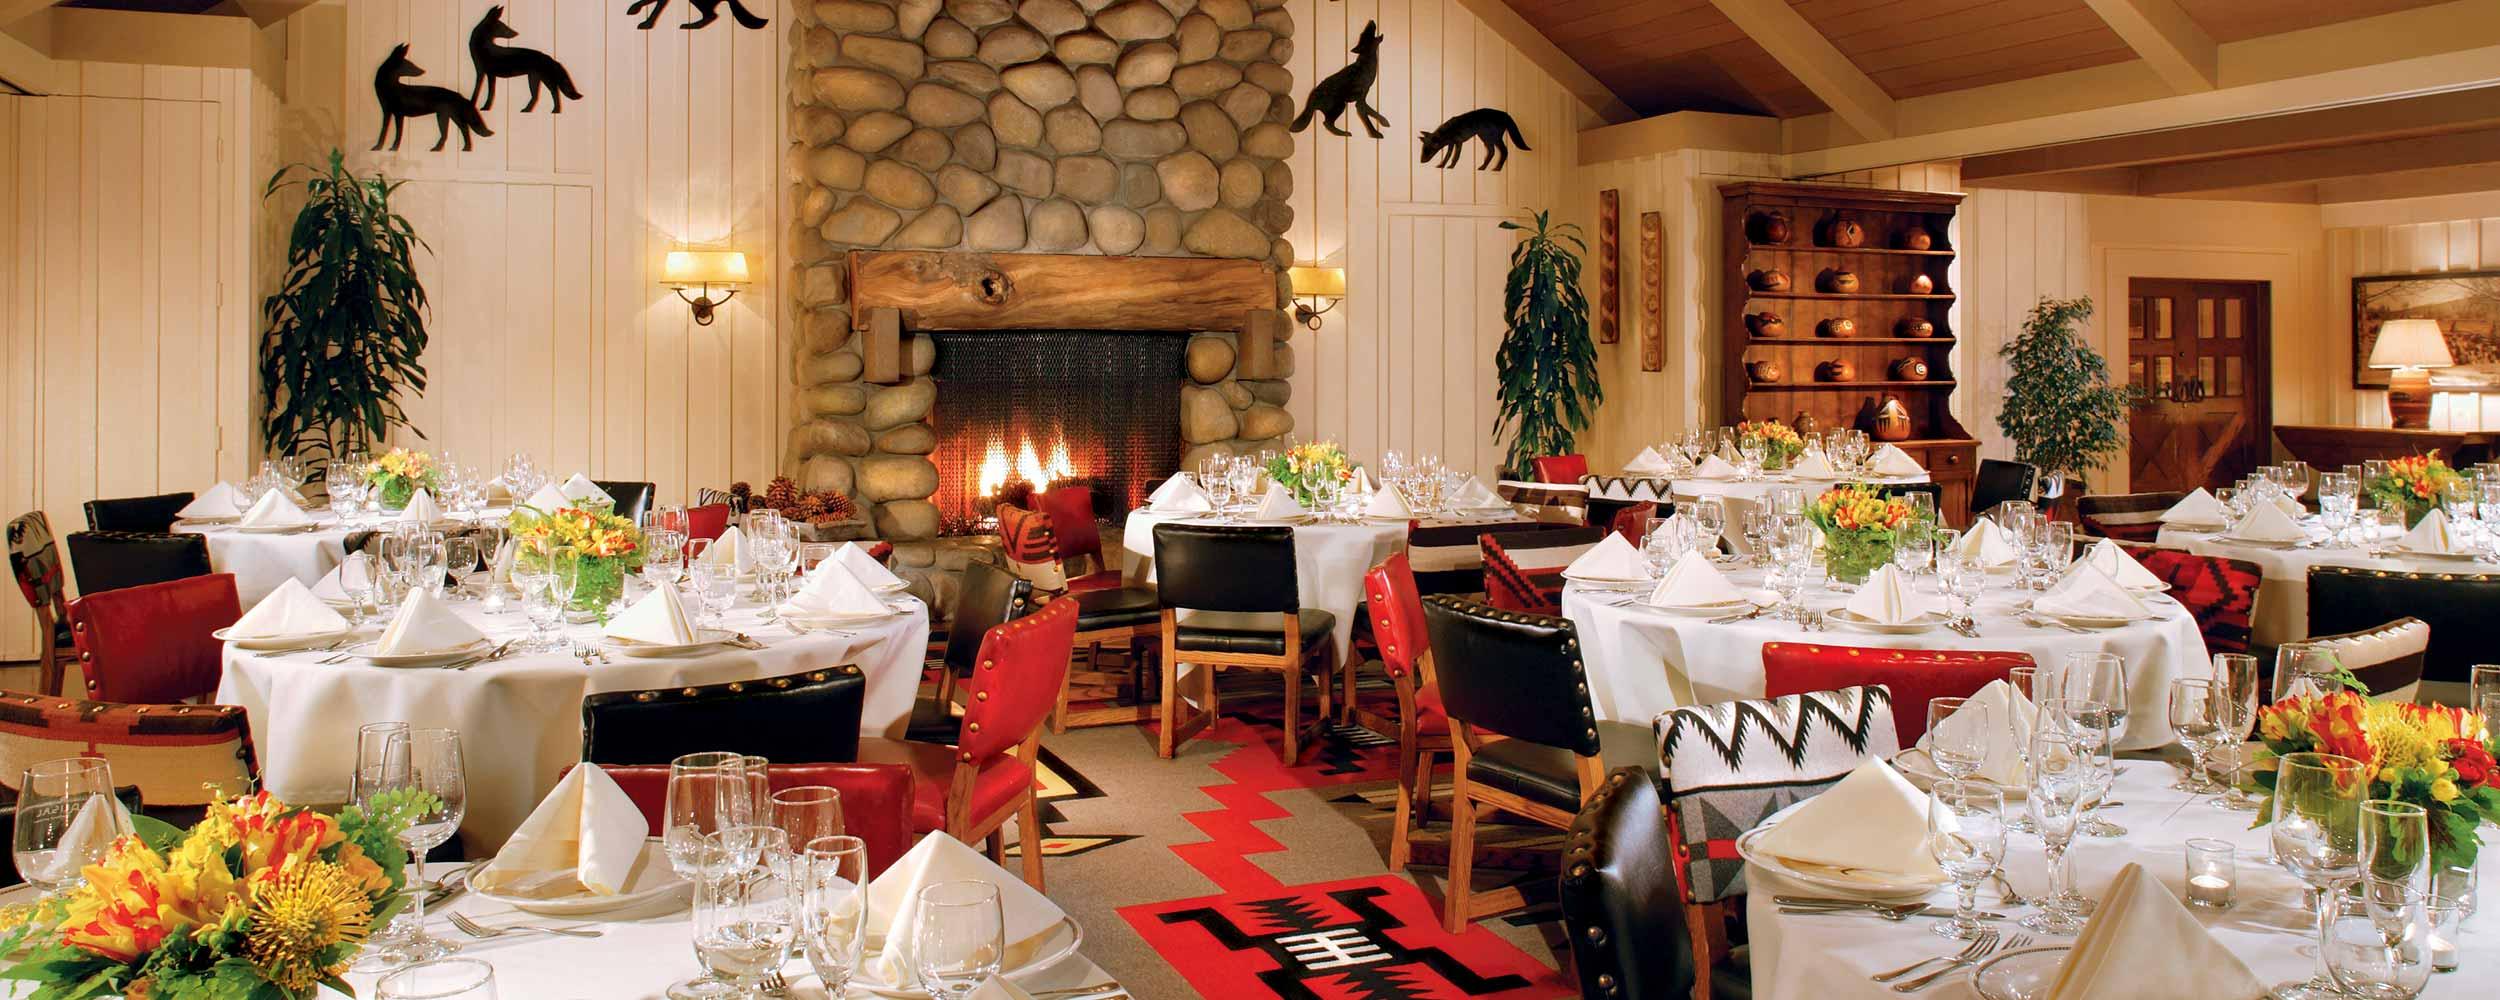 Alisal dining venue - Alisal Resort in Solvang California